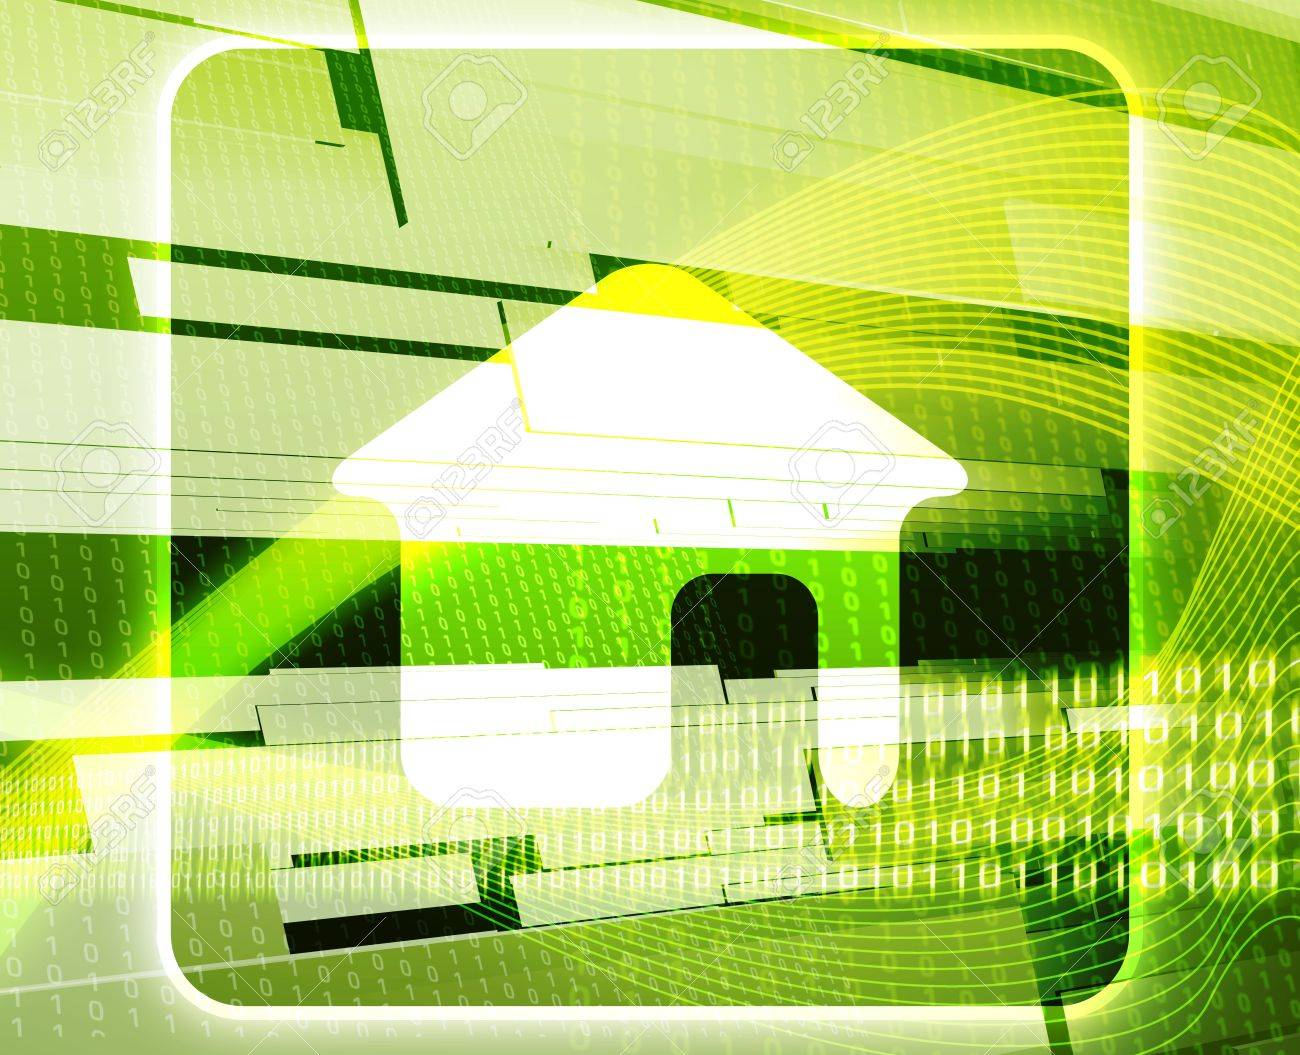 Home navigation web internet icon concept background illustration Stock Photo - 6316296